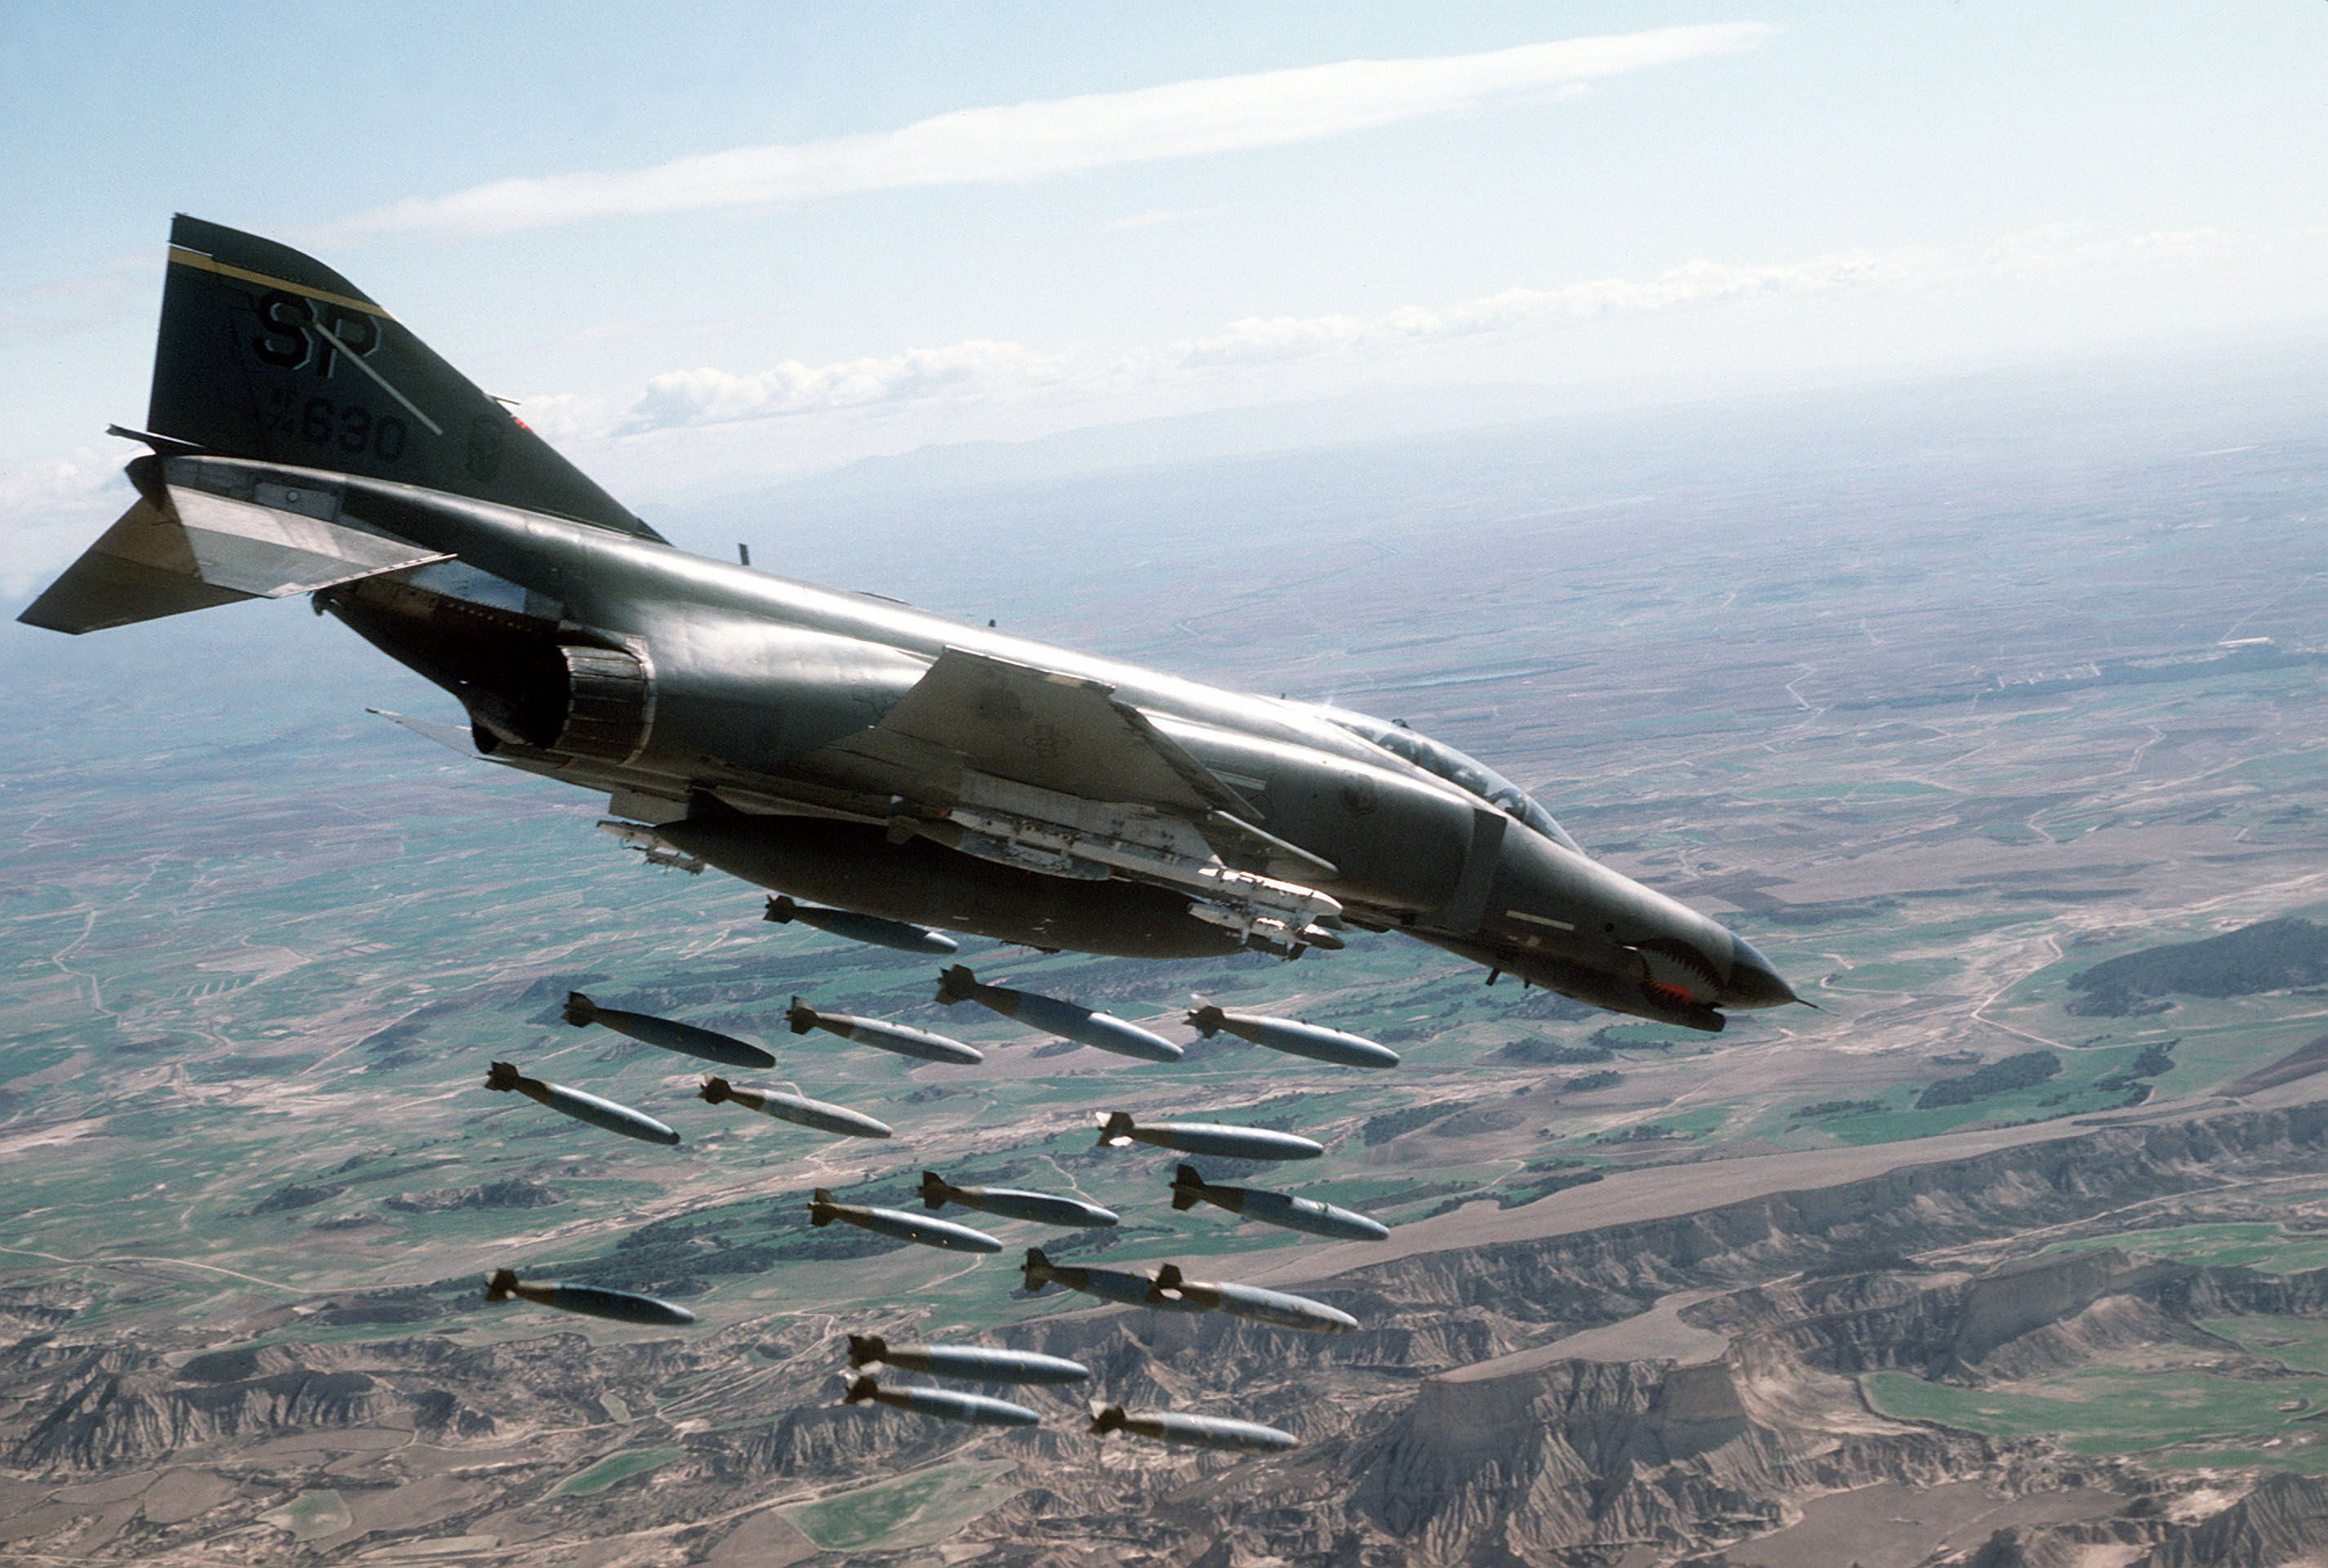 Depiction of McDonnell Douglas F-4 Phantom II